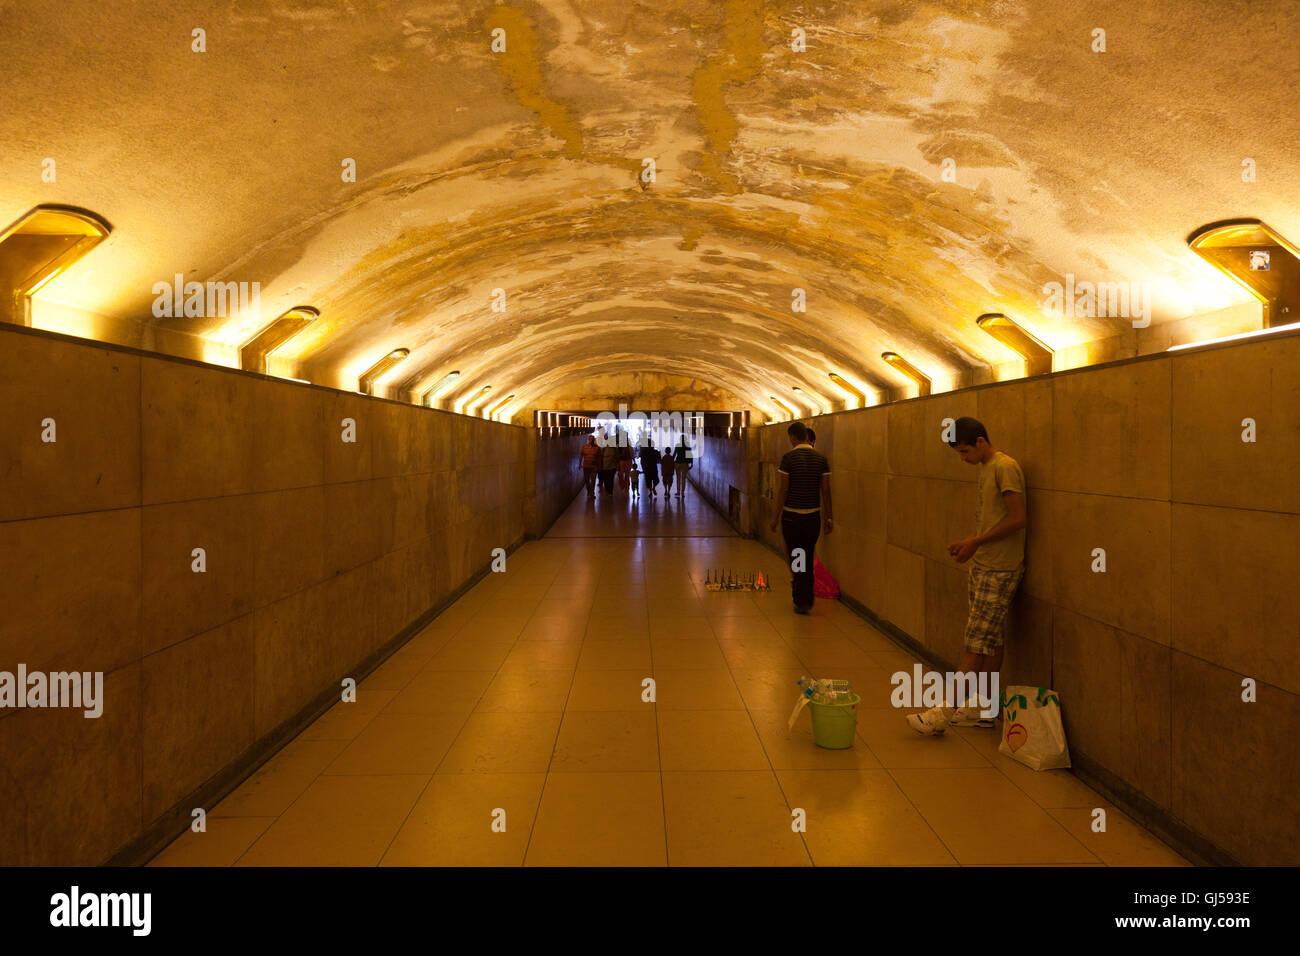 Paris underpass - Stock Image